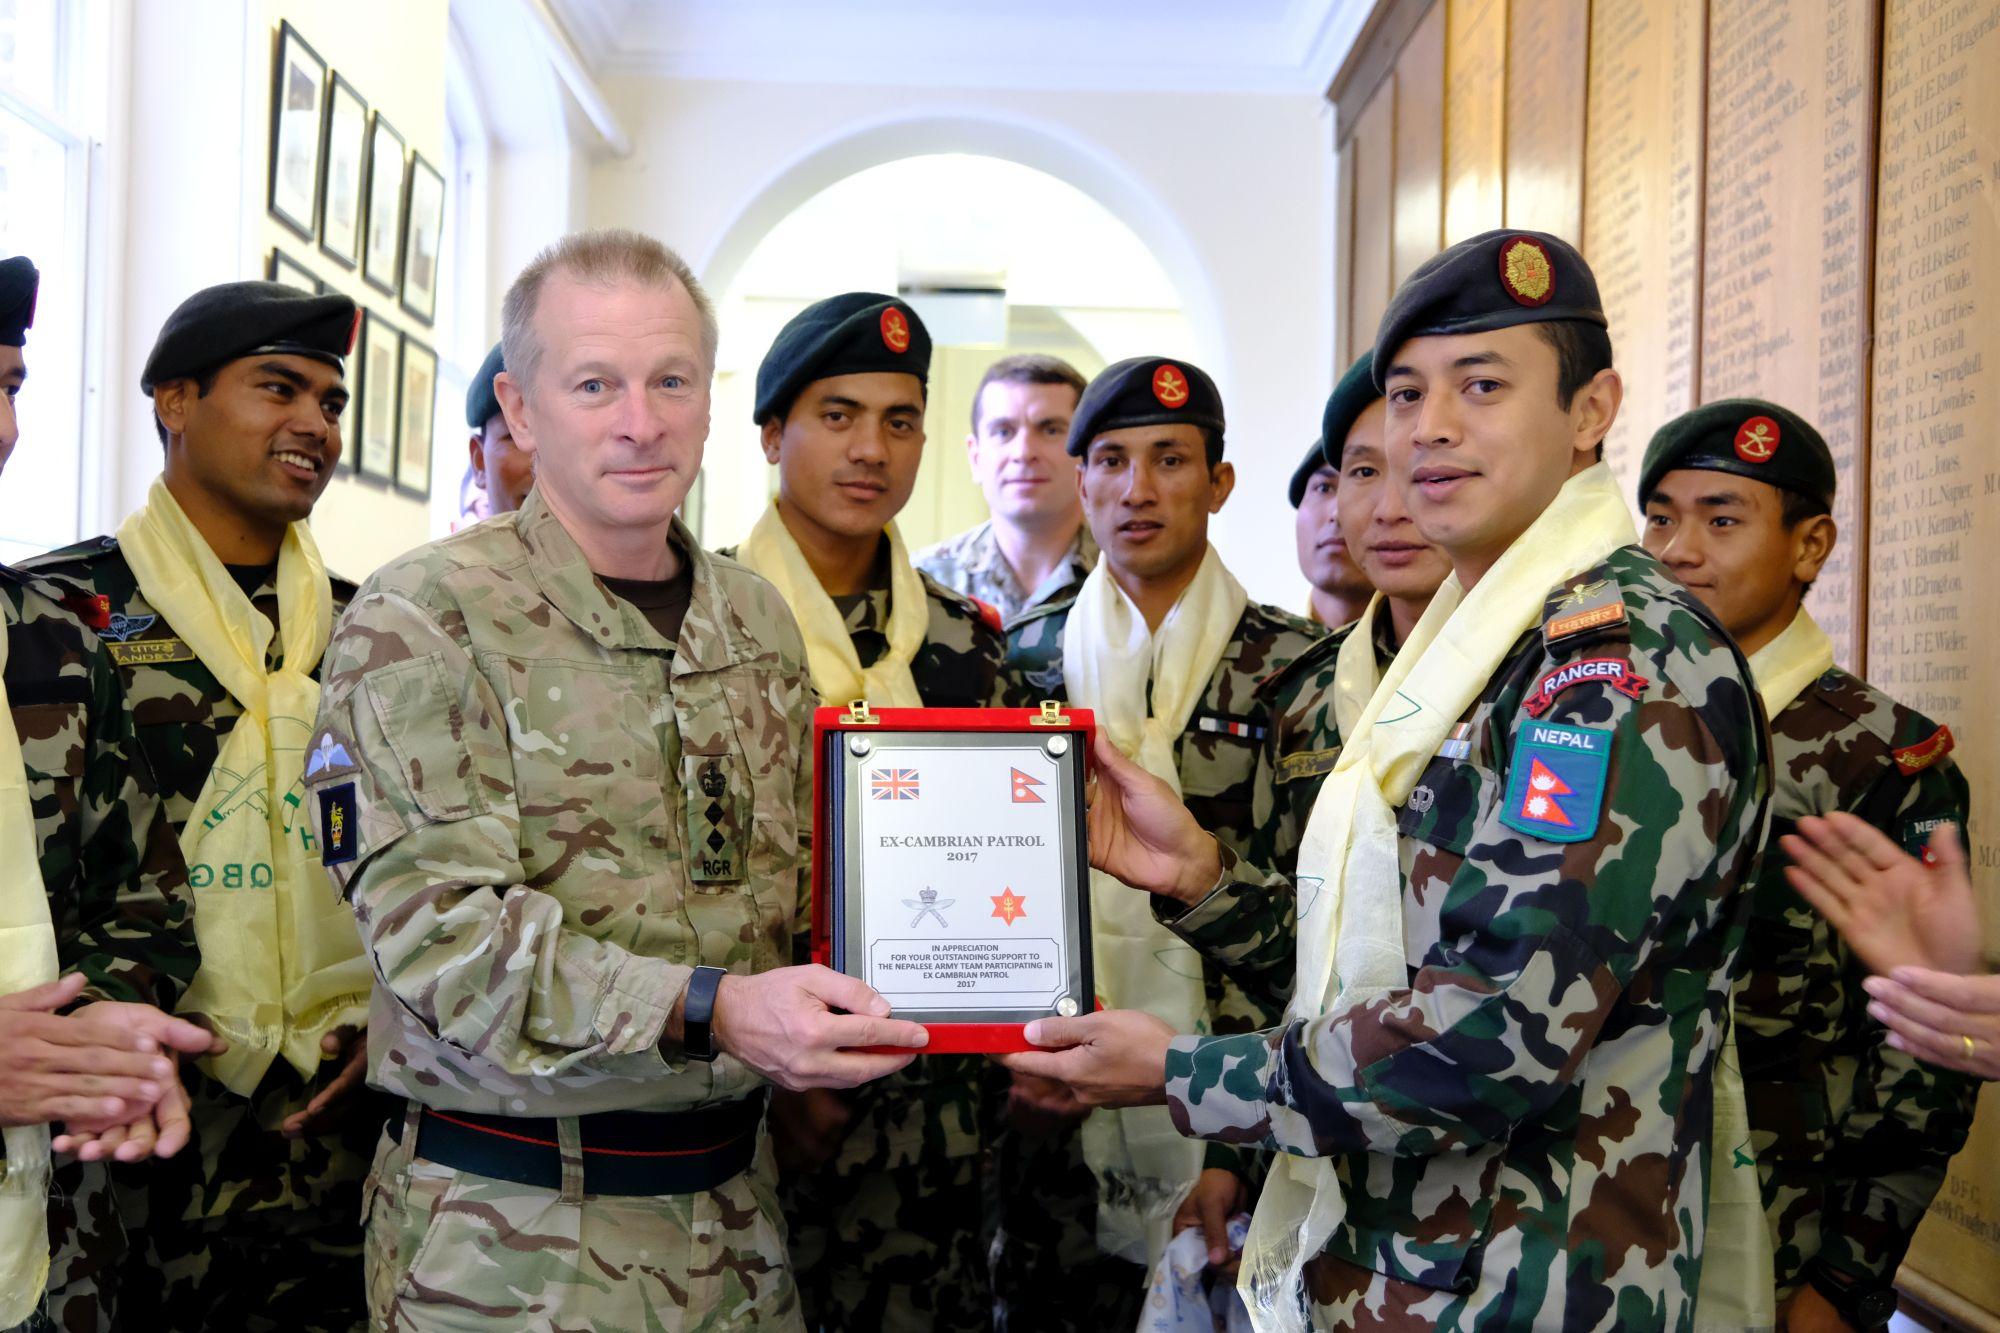 Nepal Army Cambrian Patrol Team Visit HQBG 005